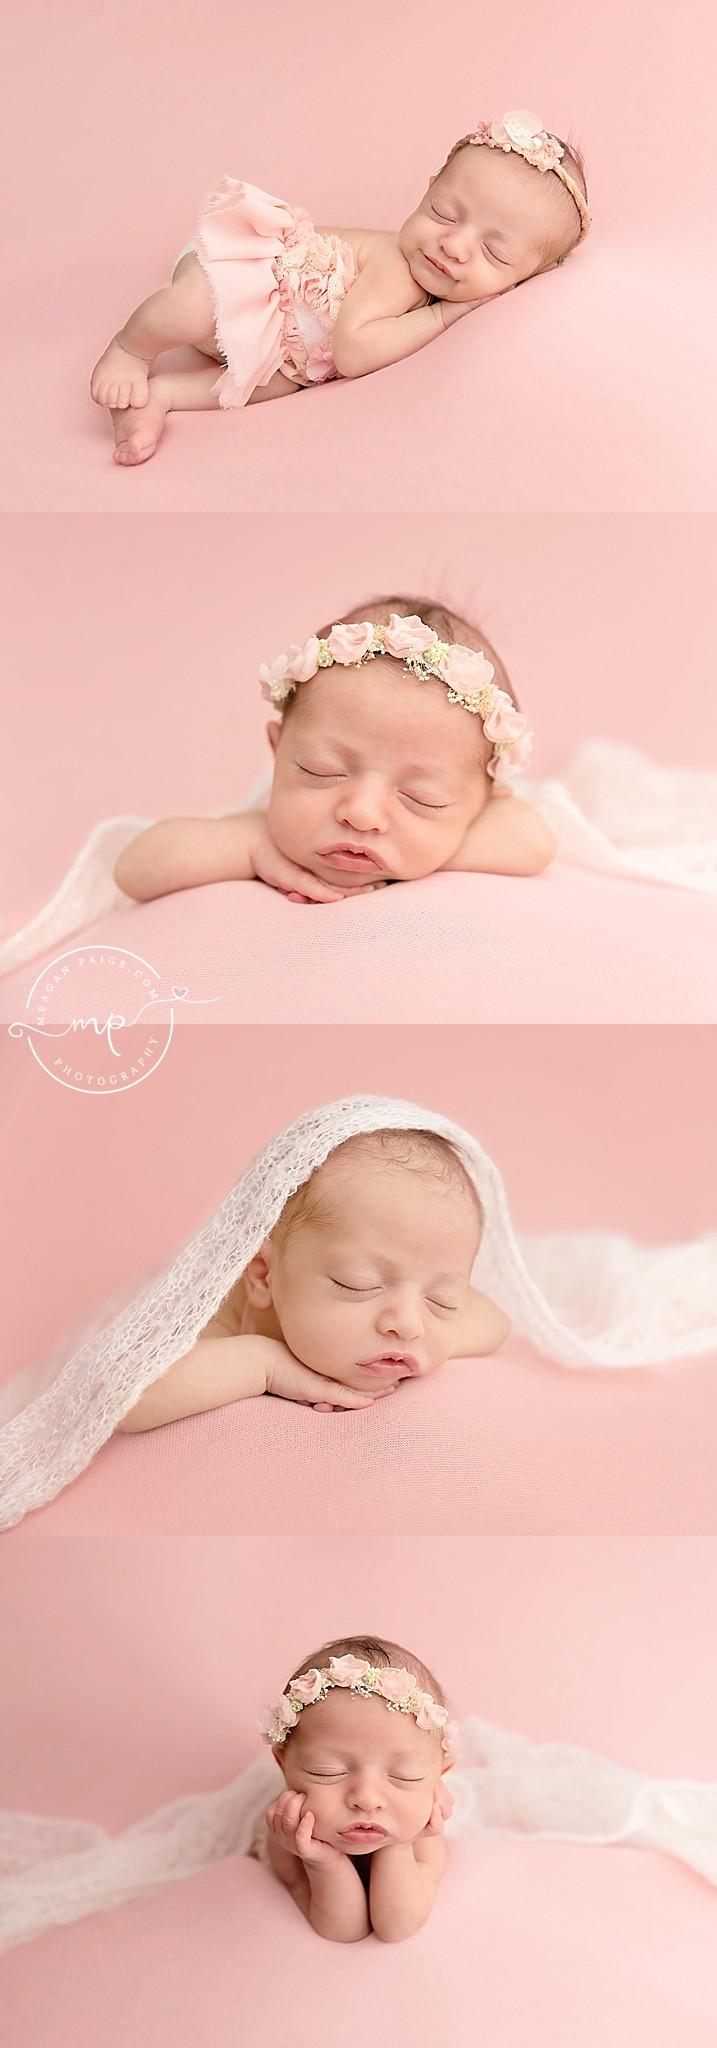 Unicorn and Princess Newborn Session - Calgary Photographer - Meagan Paige Photography